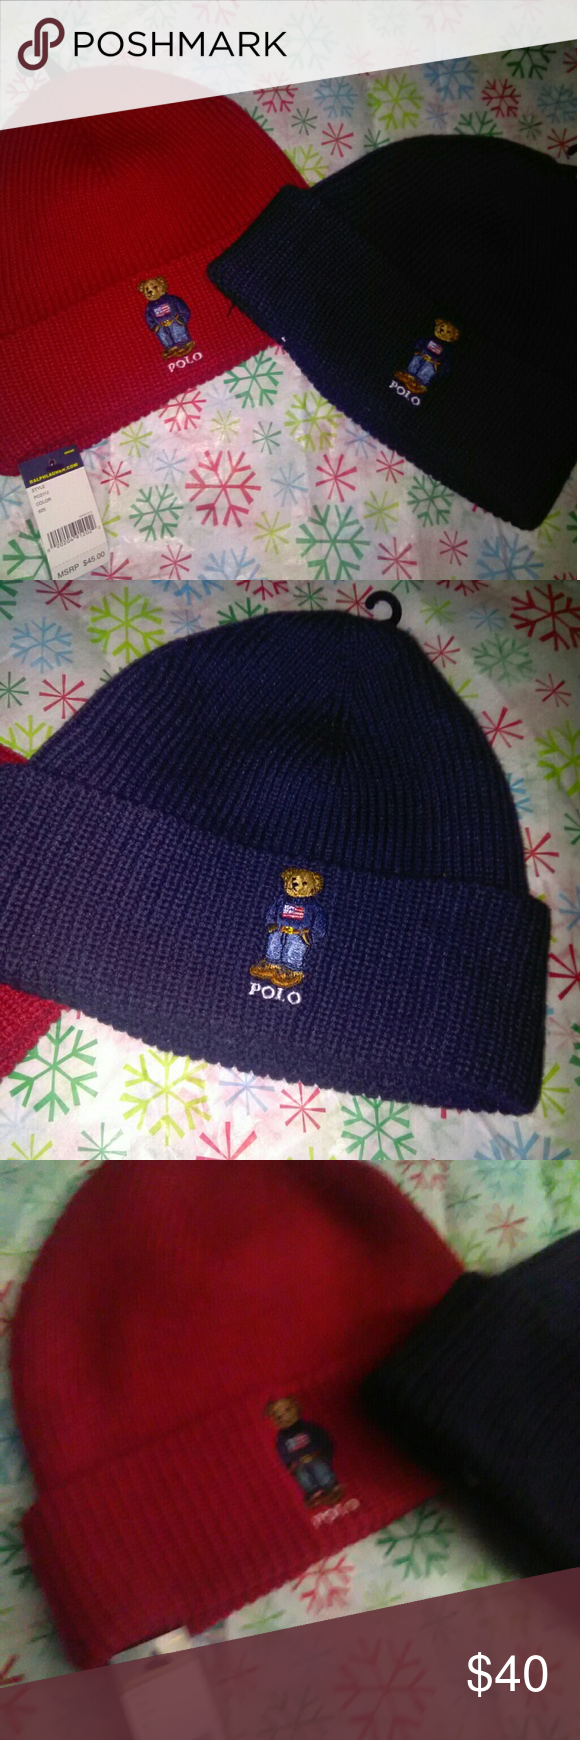 e1147ffa5 Ralph Lauren polo beanie hat choose your color new New authentic ...